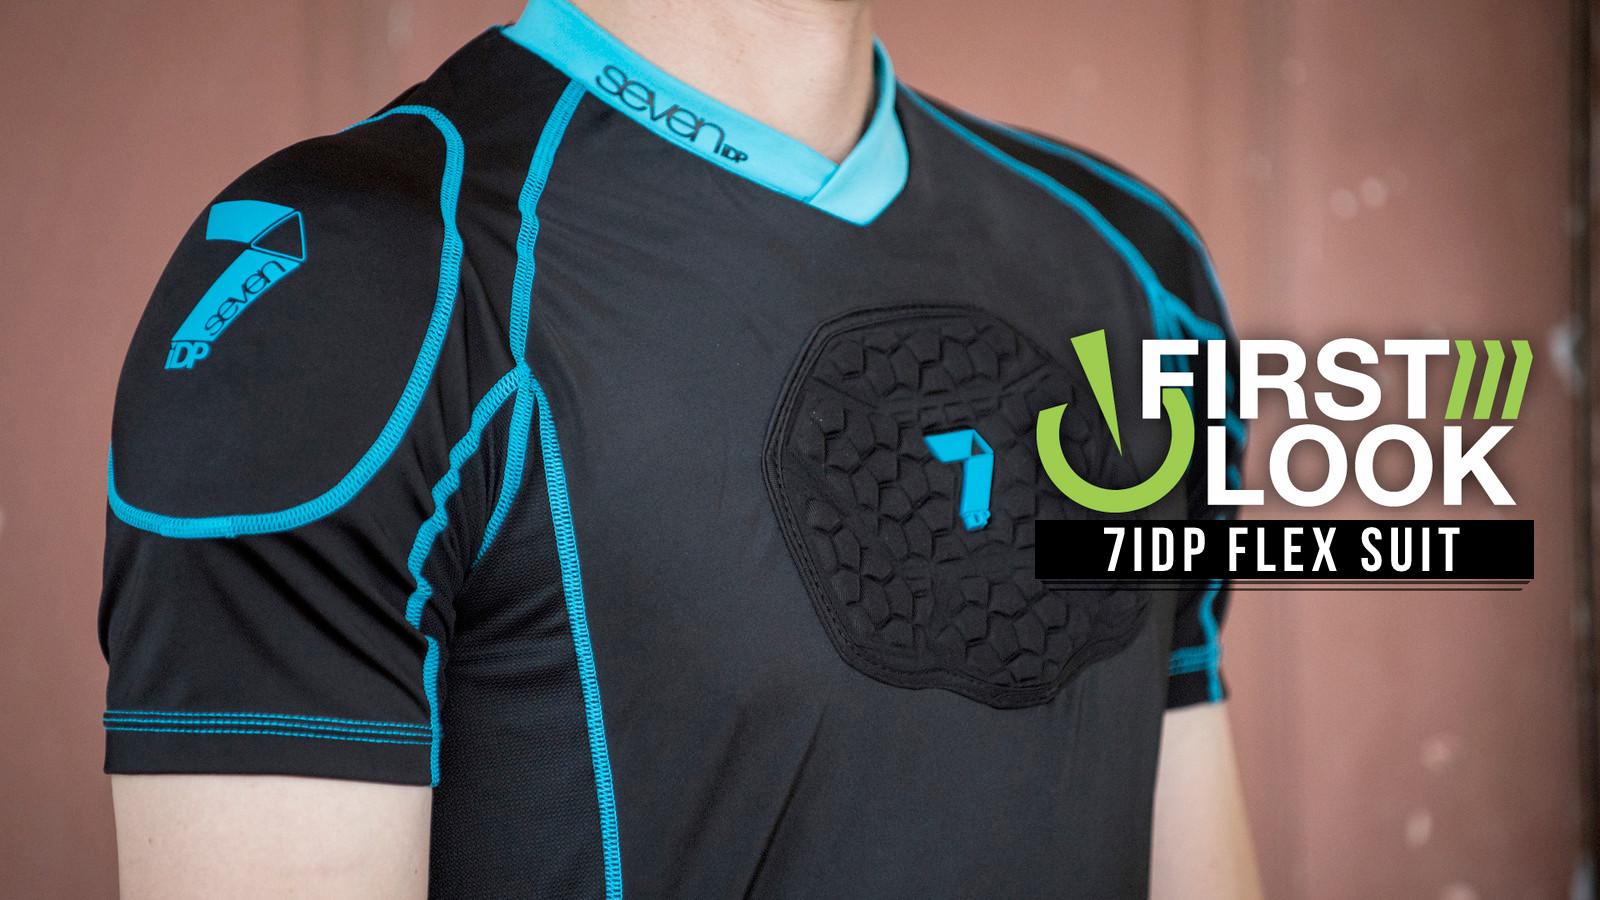 First Look: 7iDP Flex Suit